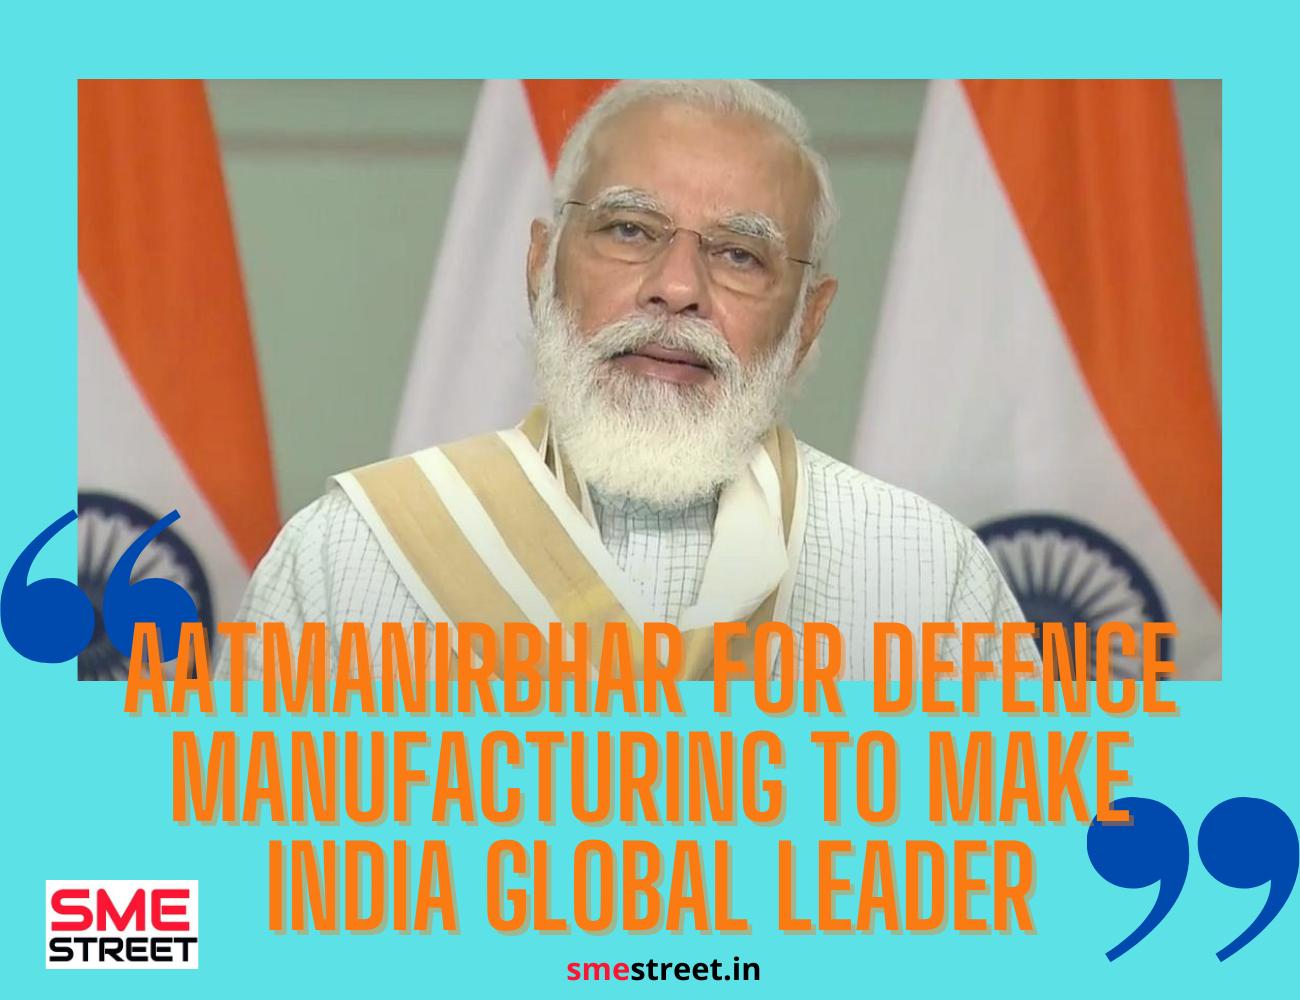 Narendra Modi, Aatmanirbhar Bharat, Defence Manufacturing, SMEStreet